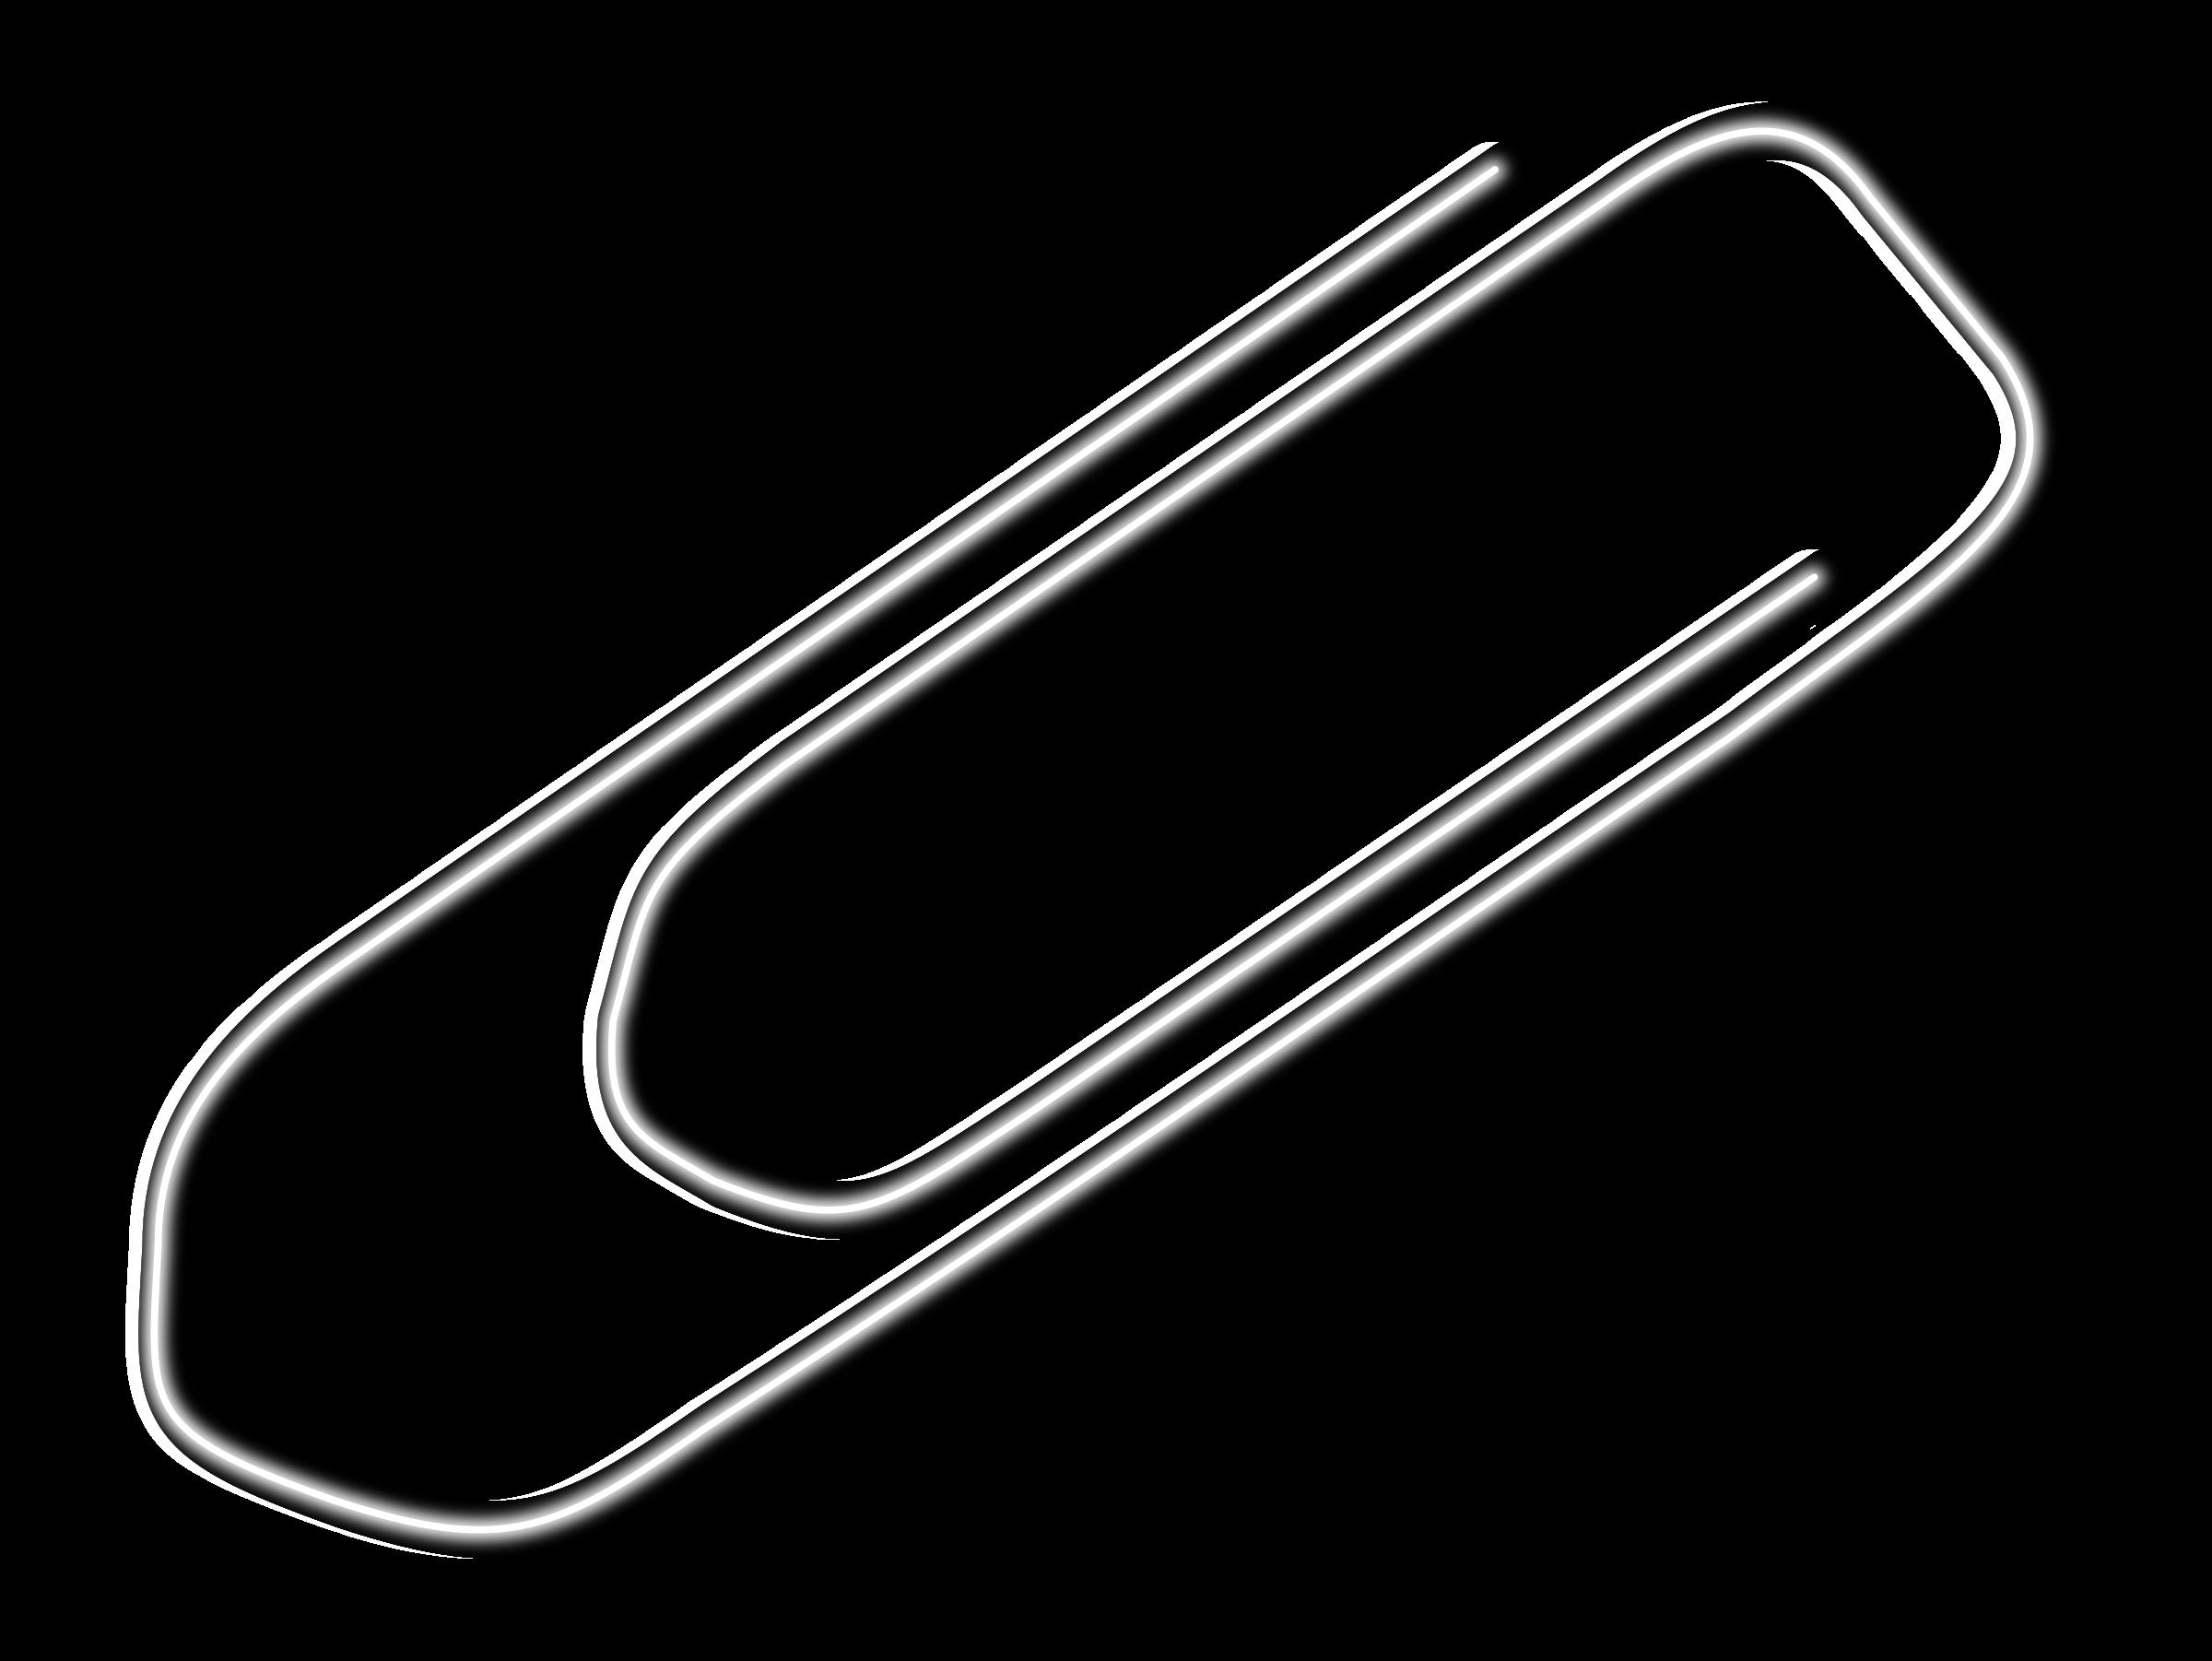 clipart - paper clip